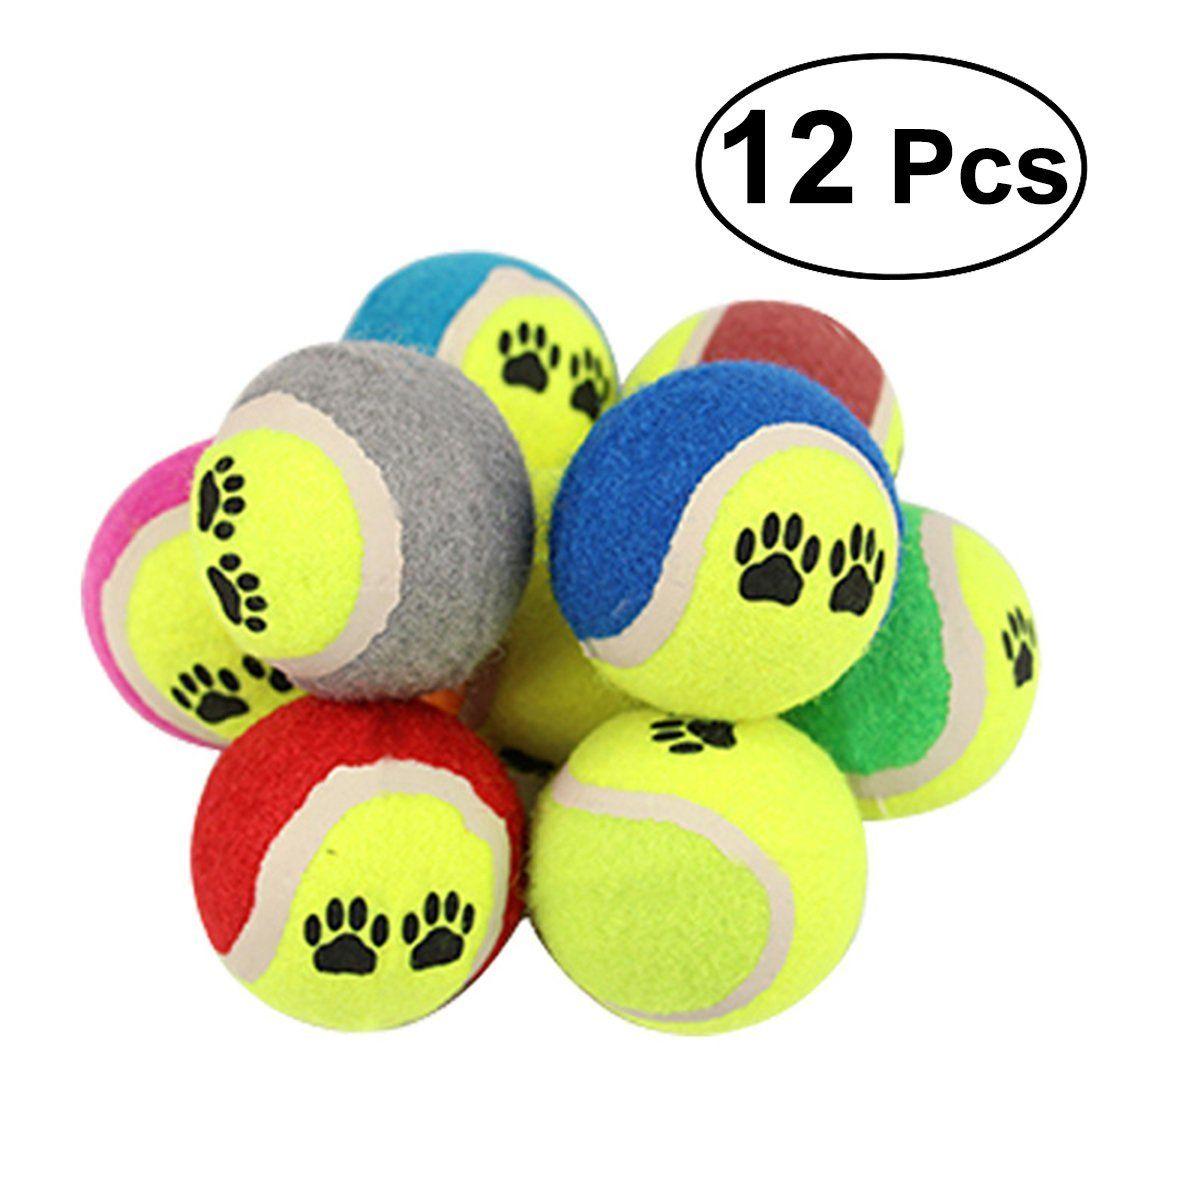 Ueetek 12pcs Pet Dog Tennis Balls Dog Chew Toys Funny Pet Cat